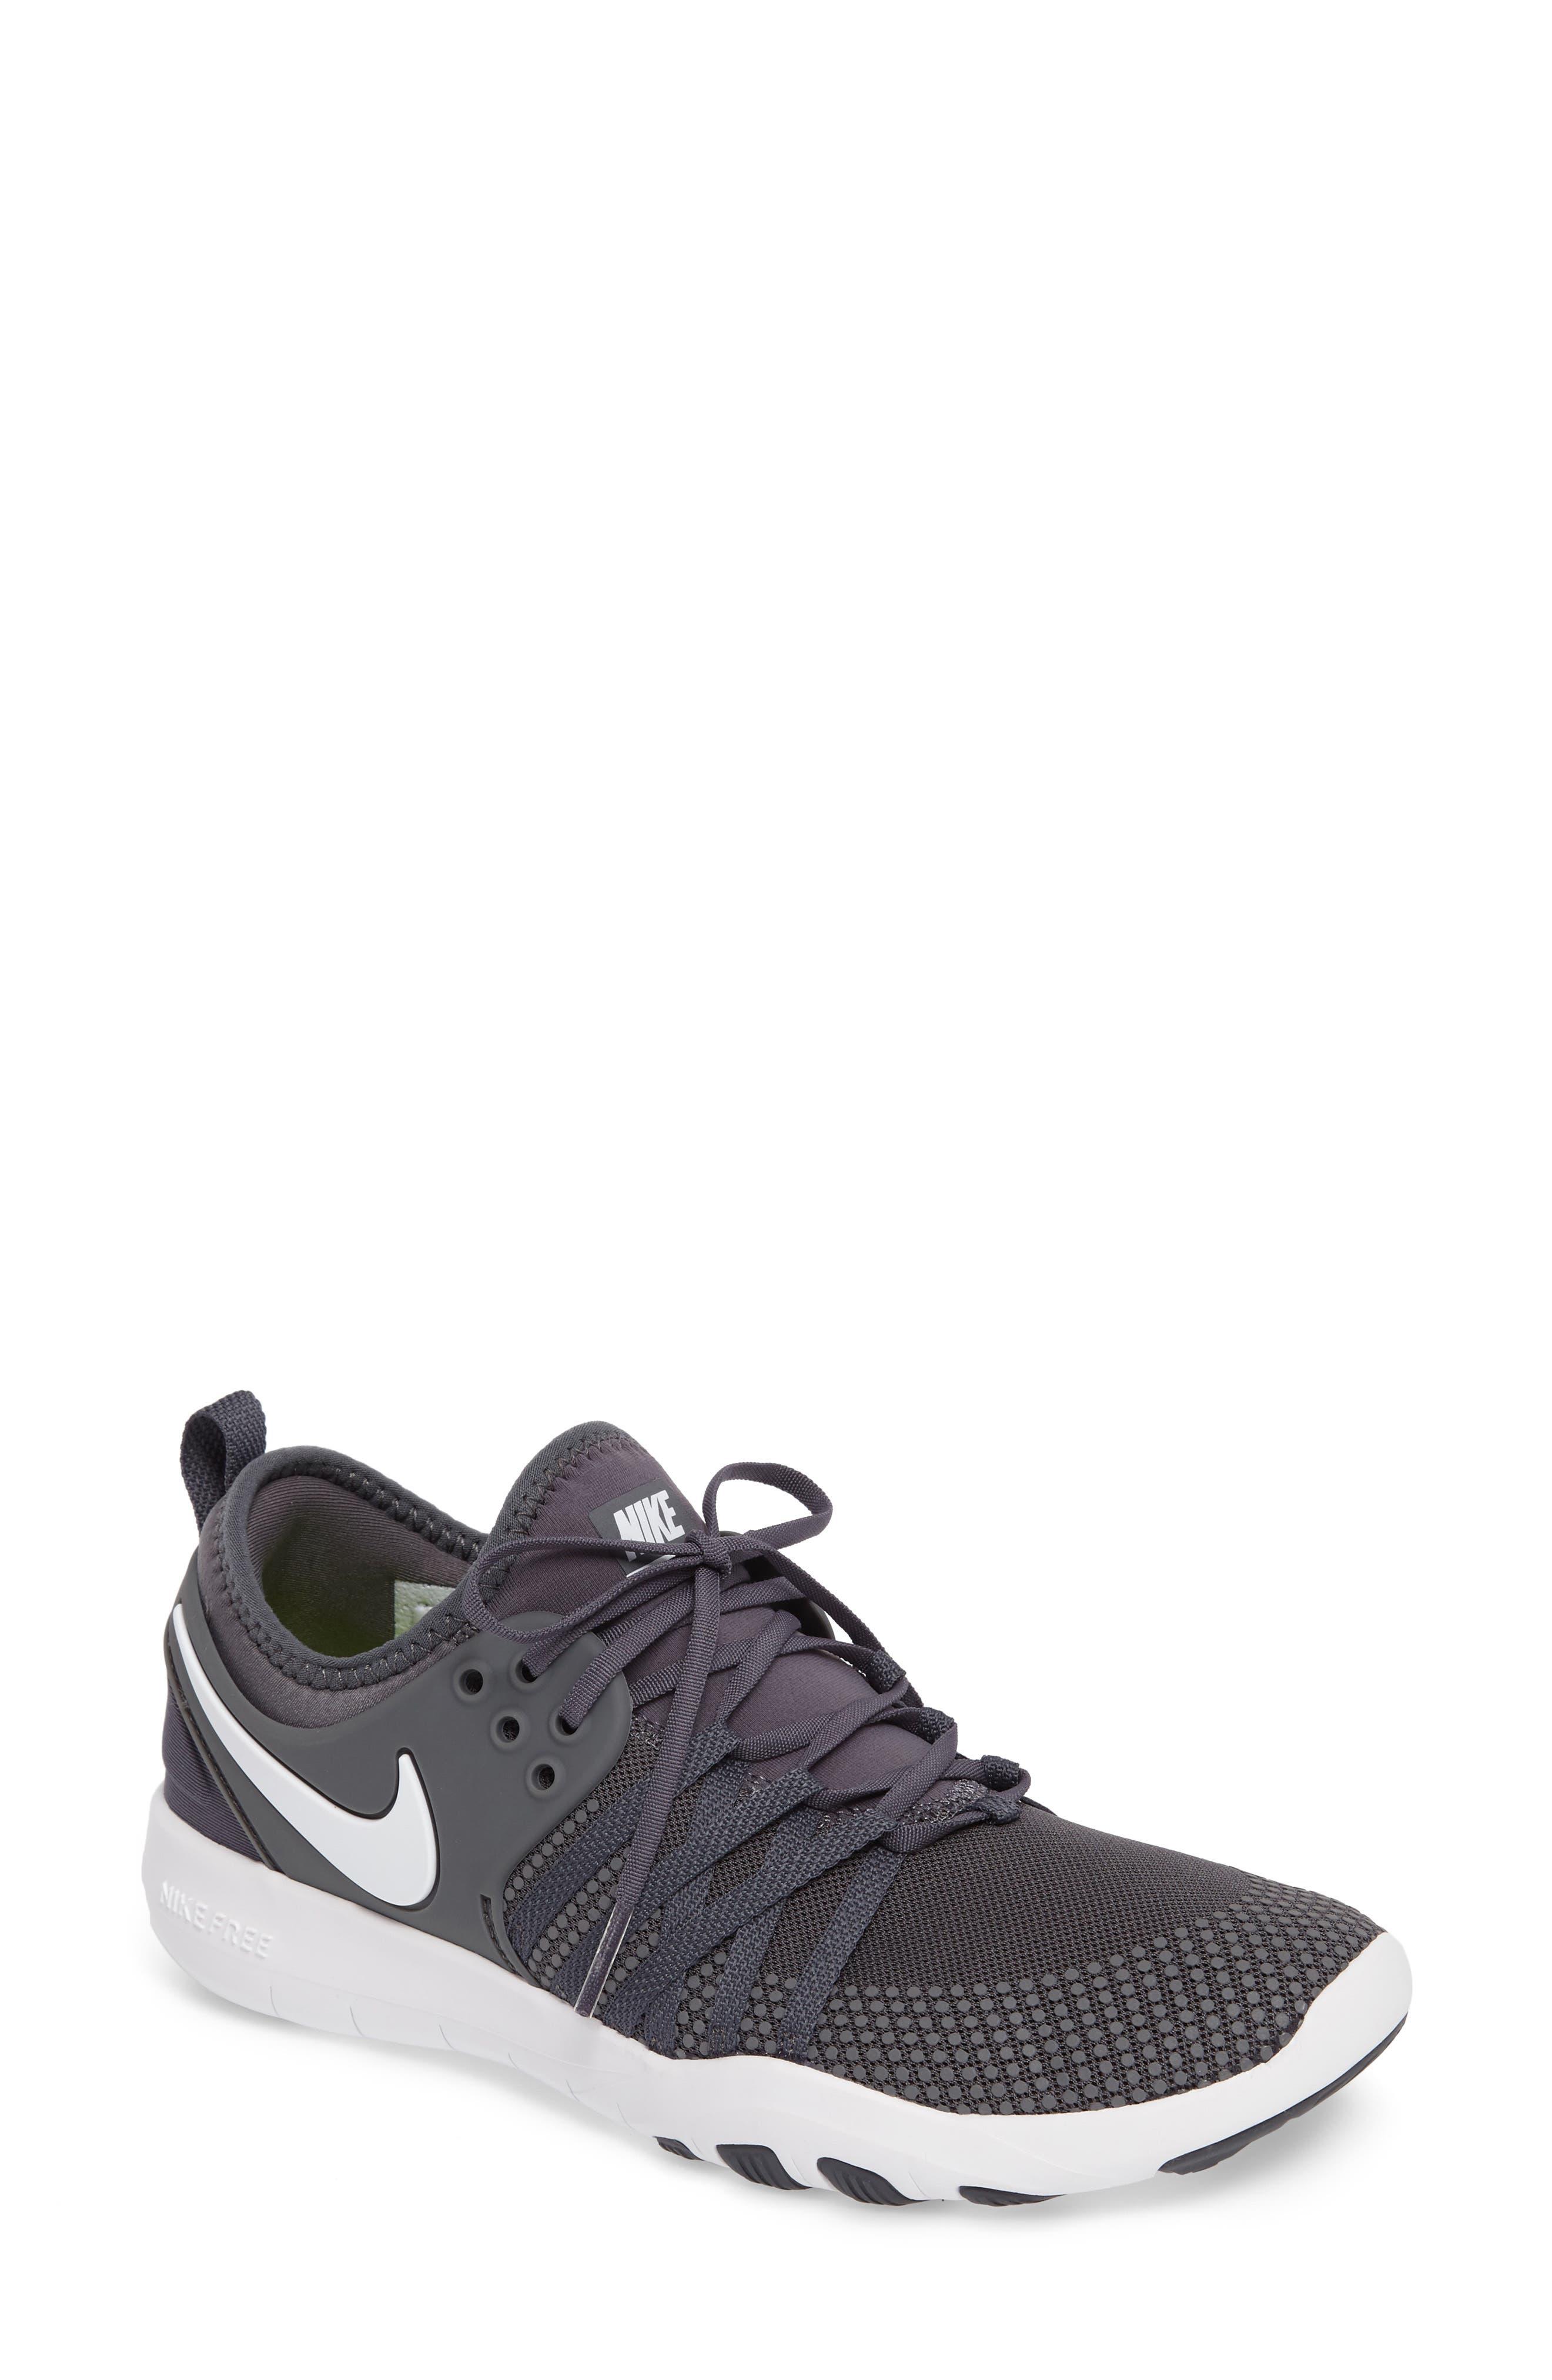 Nike Free Run | Nordstrom